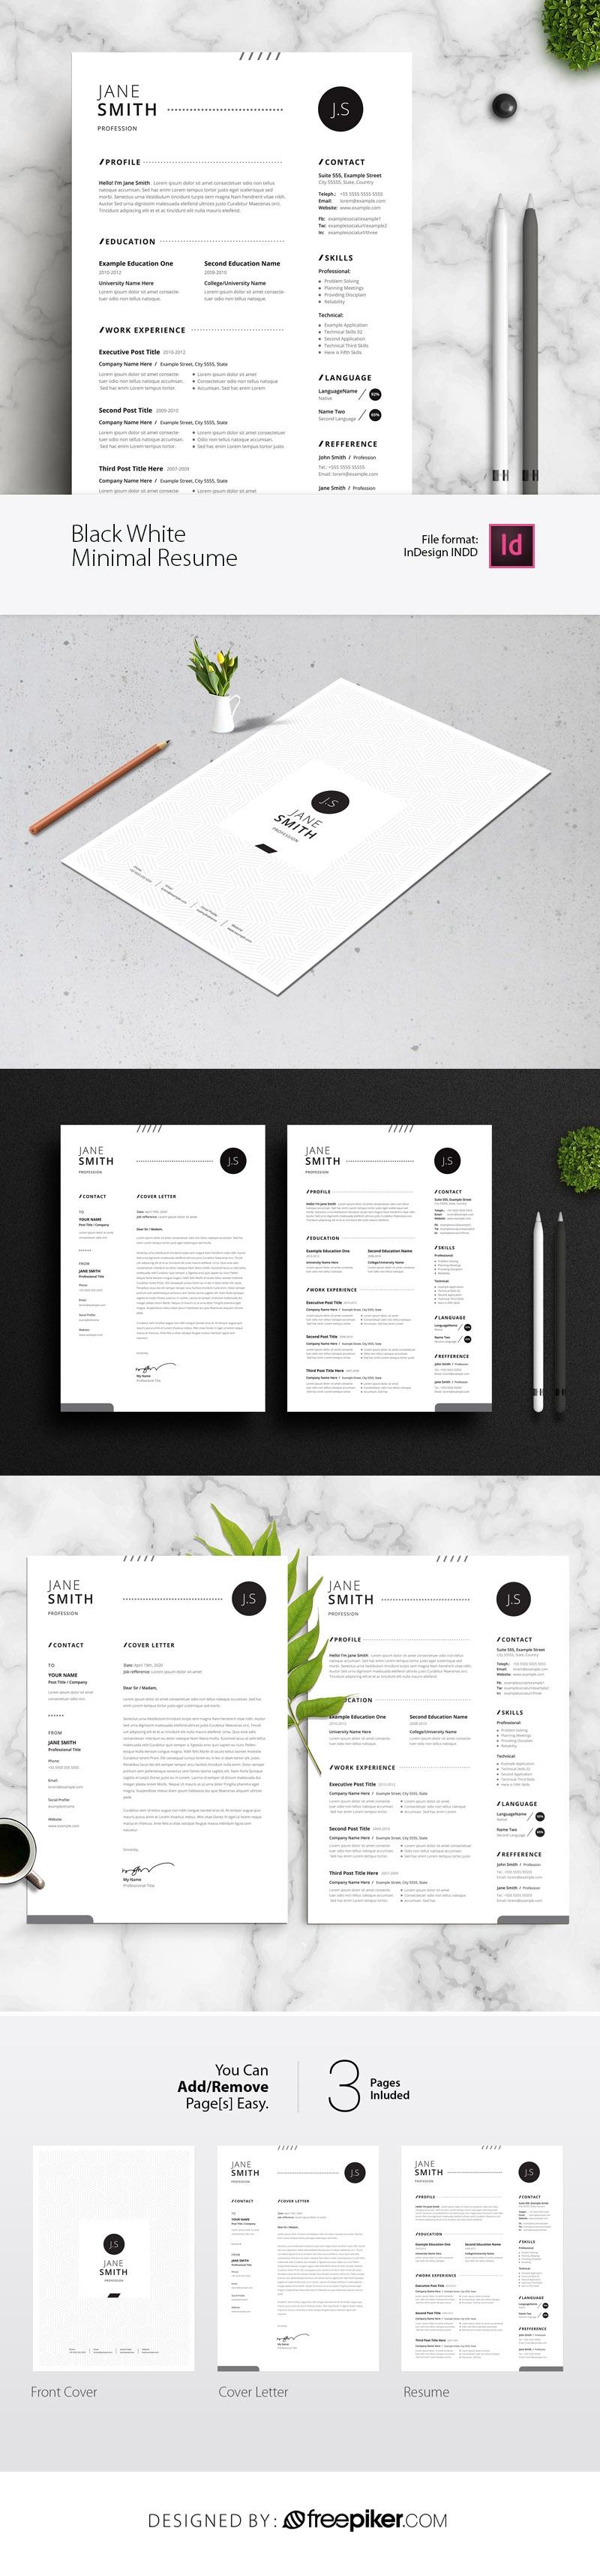 Black White Minimal Resume / CV